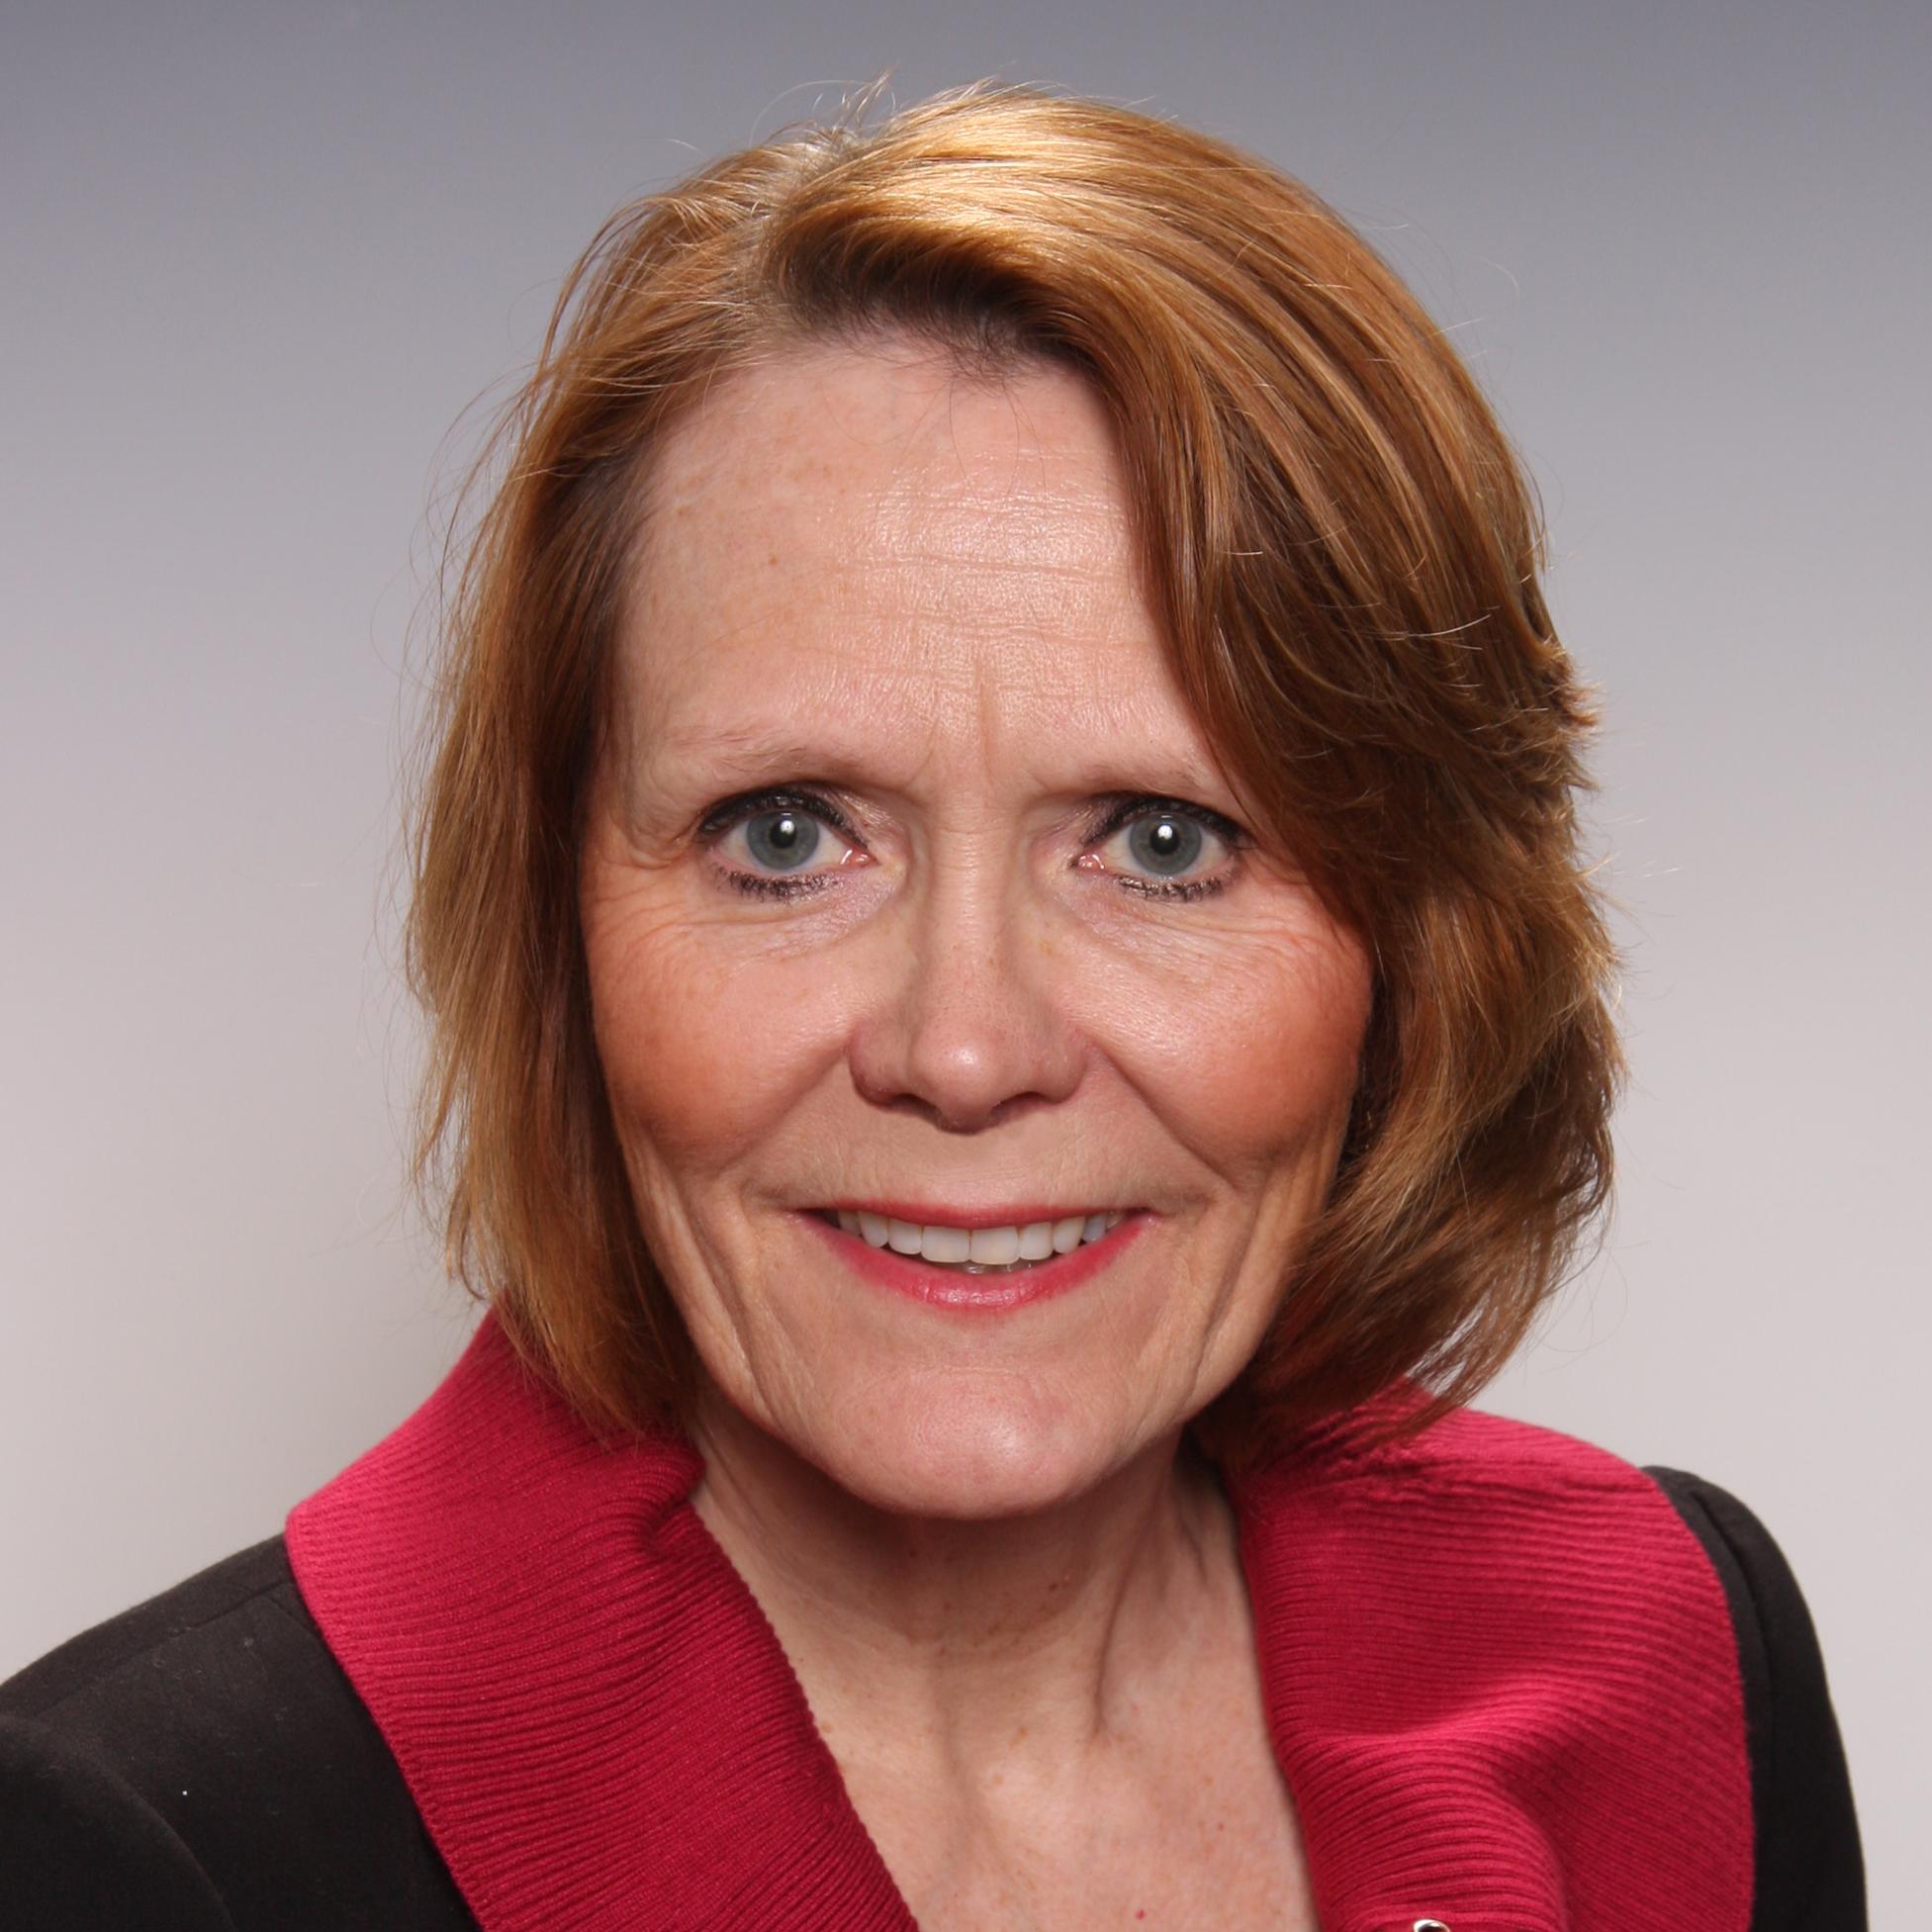 Sharon Tucker portrait